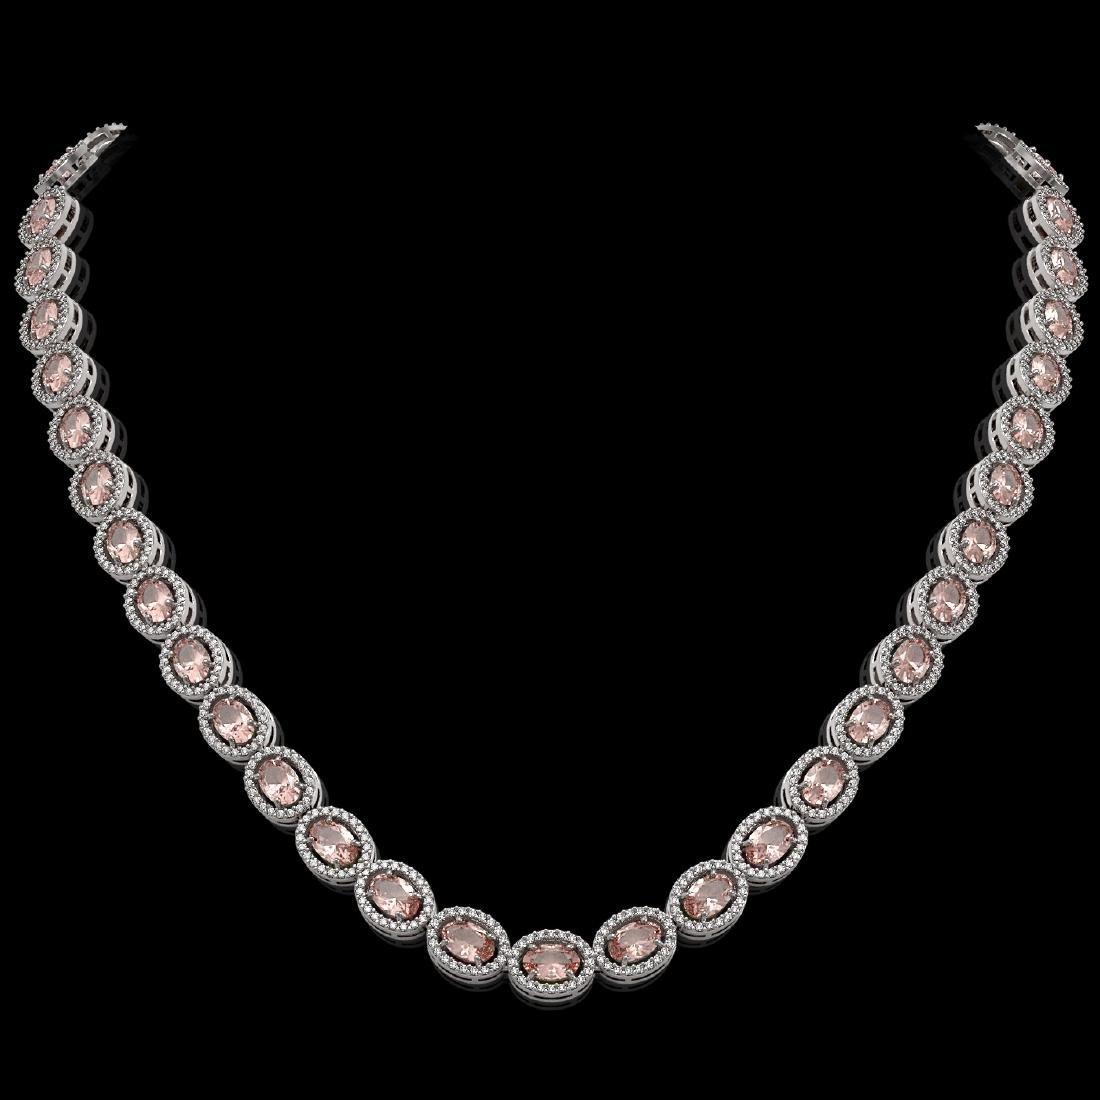 31.96 CTW Morganite & Diamond Halo Necklace 10K White